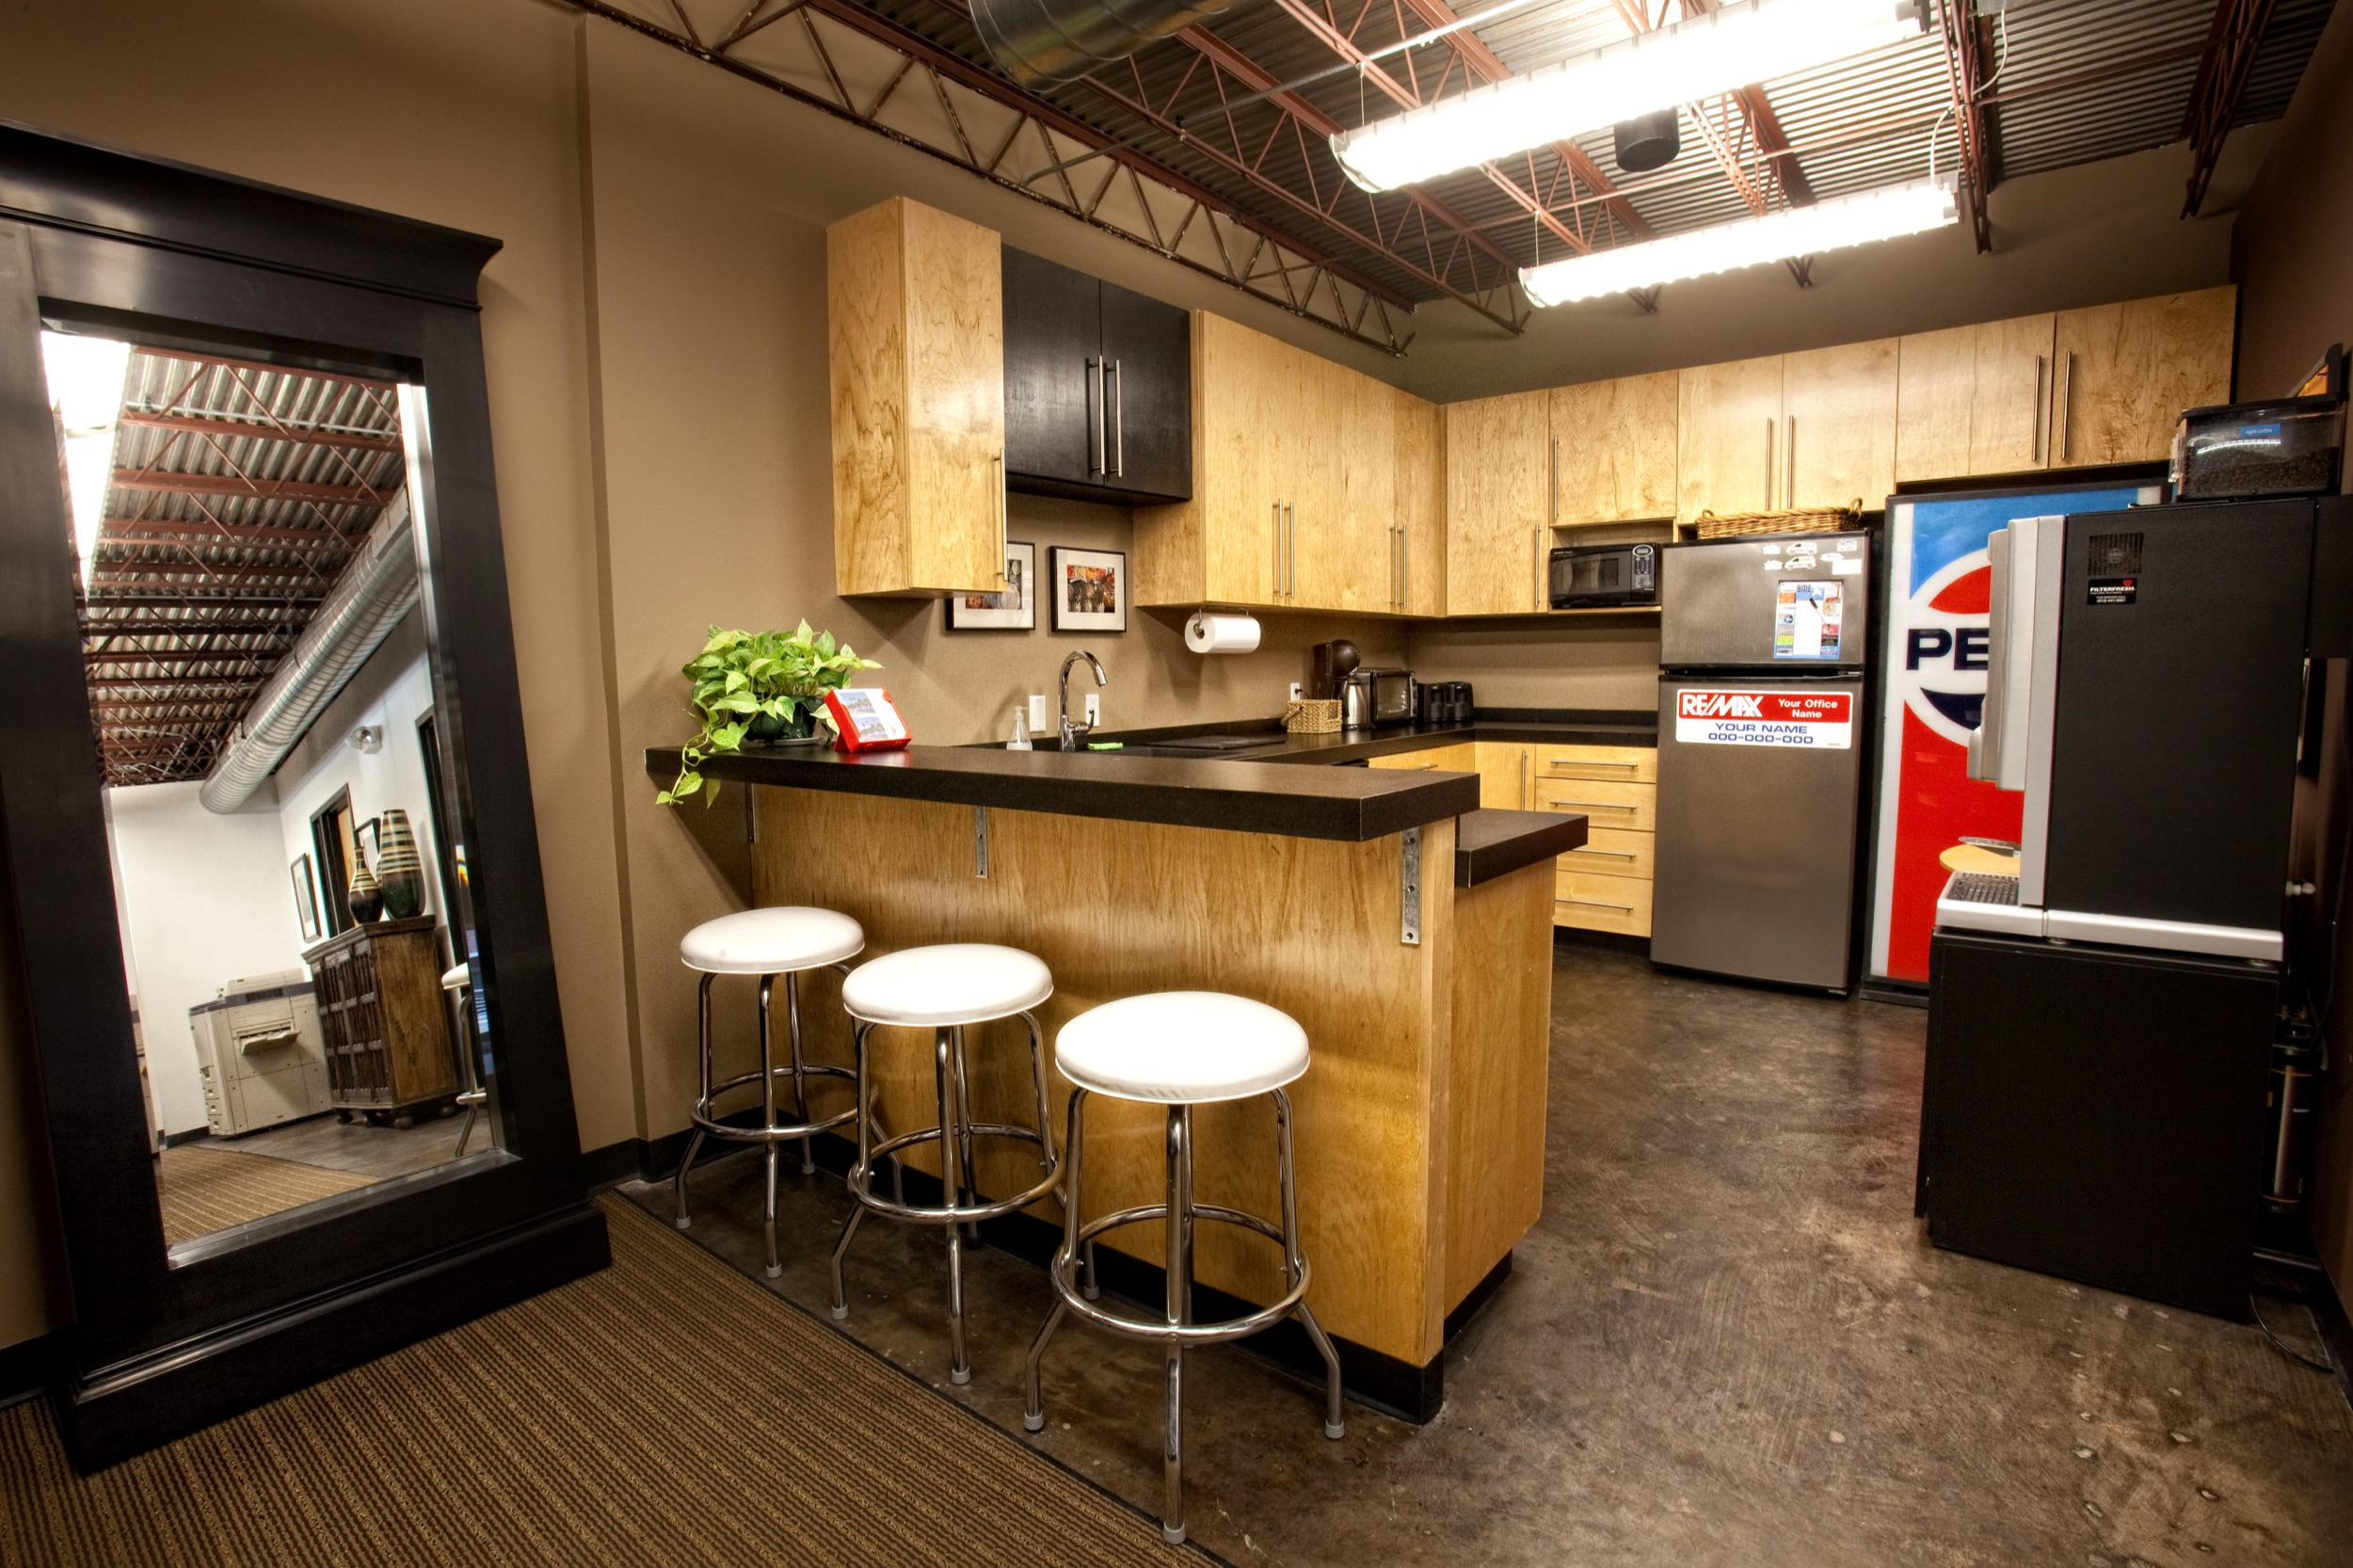 Employee break room kitchen